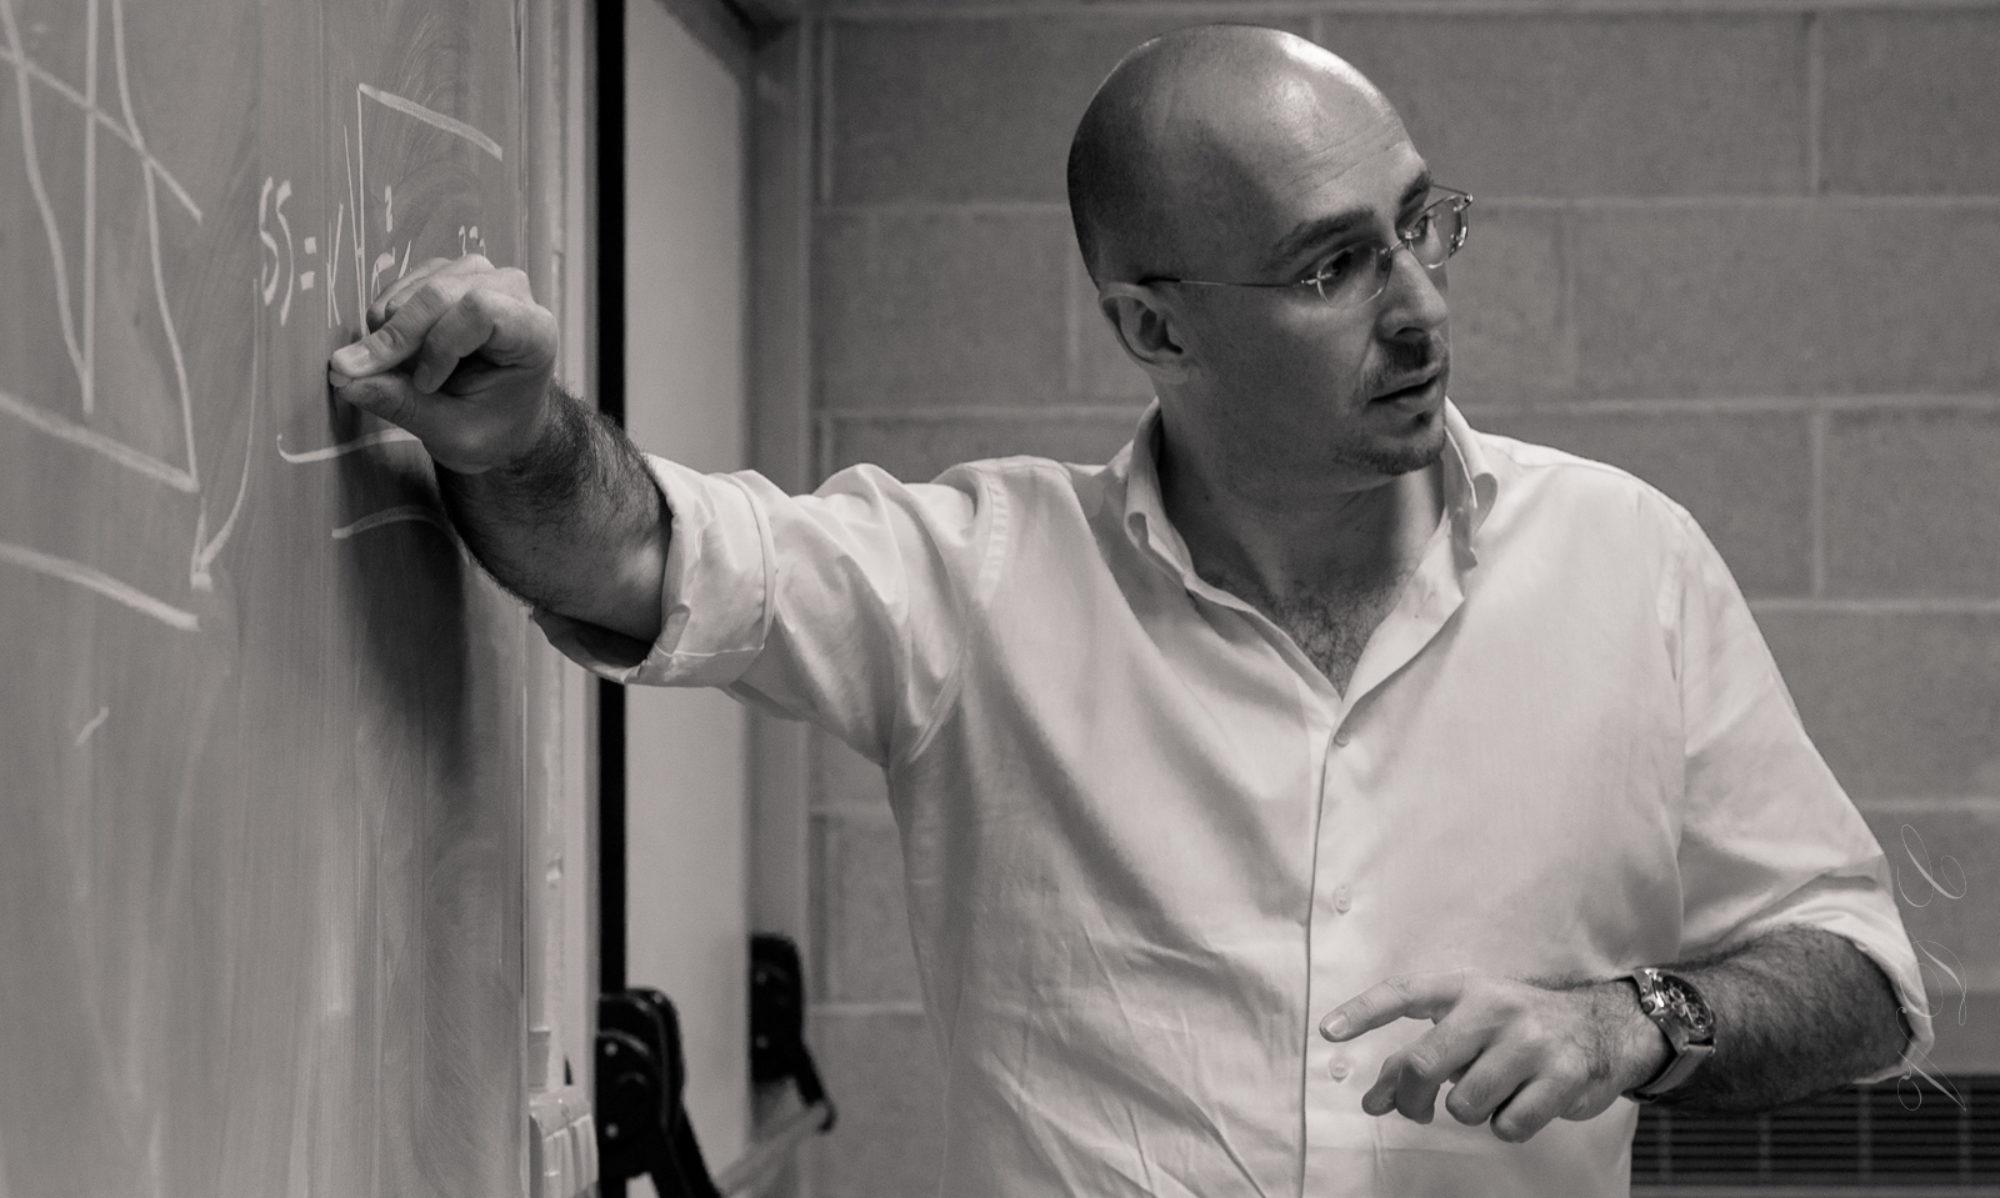 Max Schiraldi